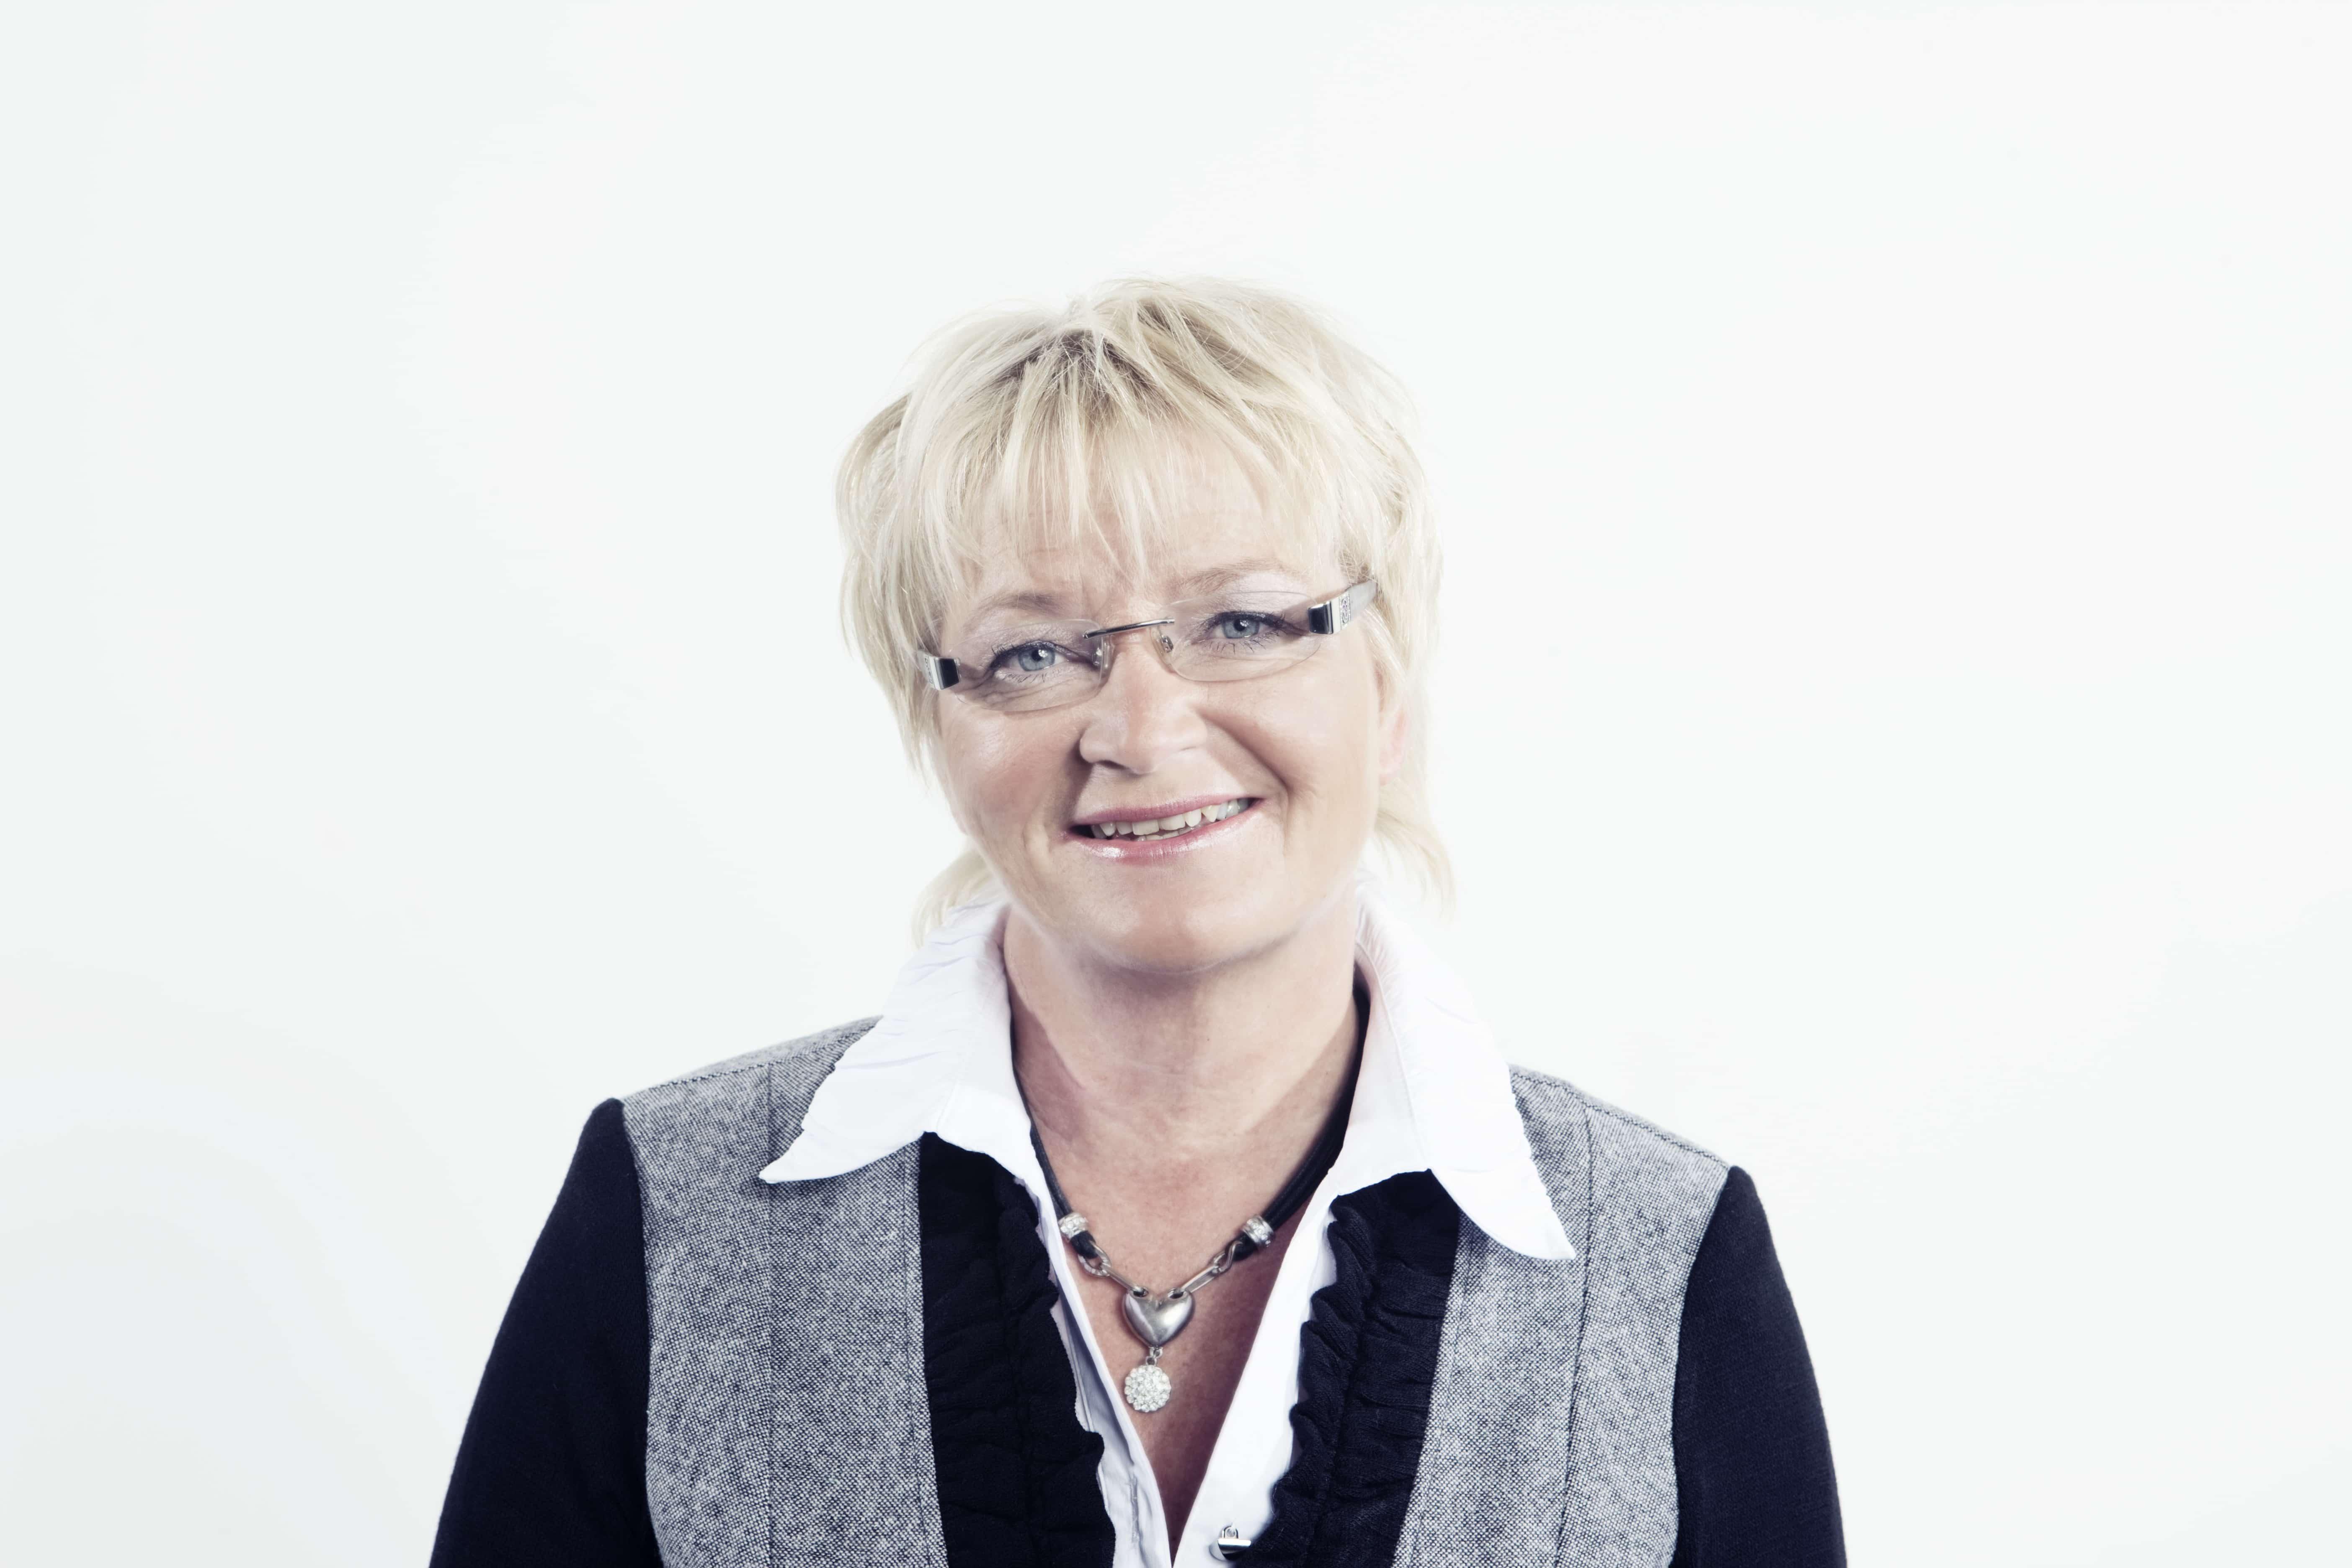 lisbeth-g-petersen-foredrag-foredragsholder-stress-glæde